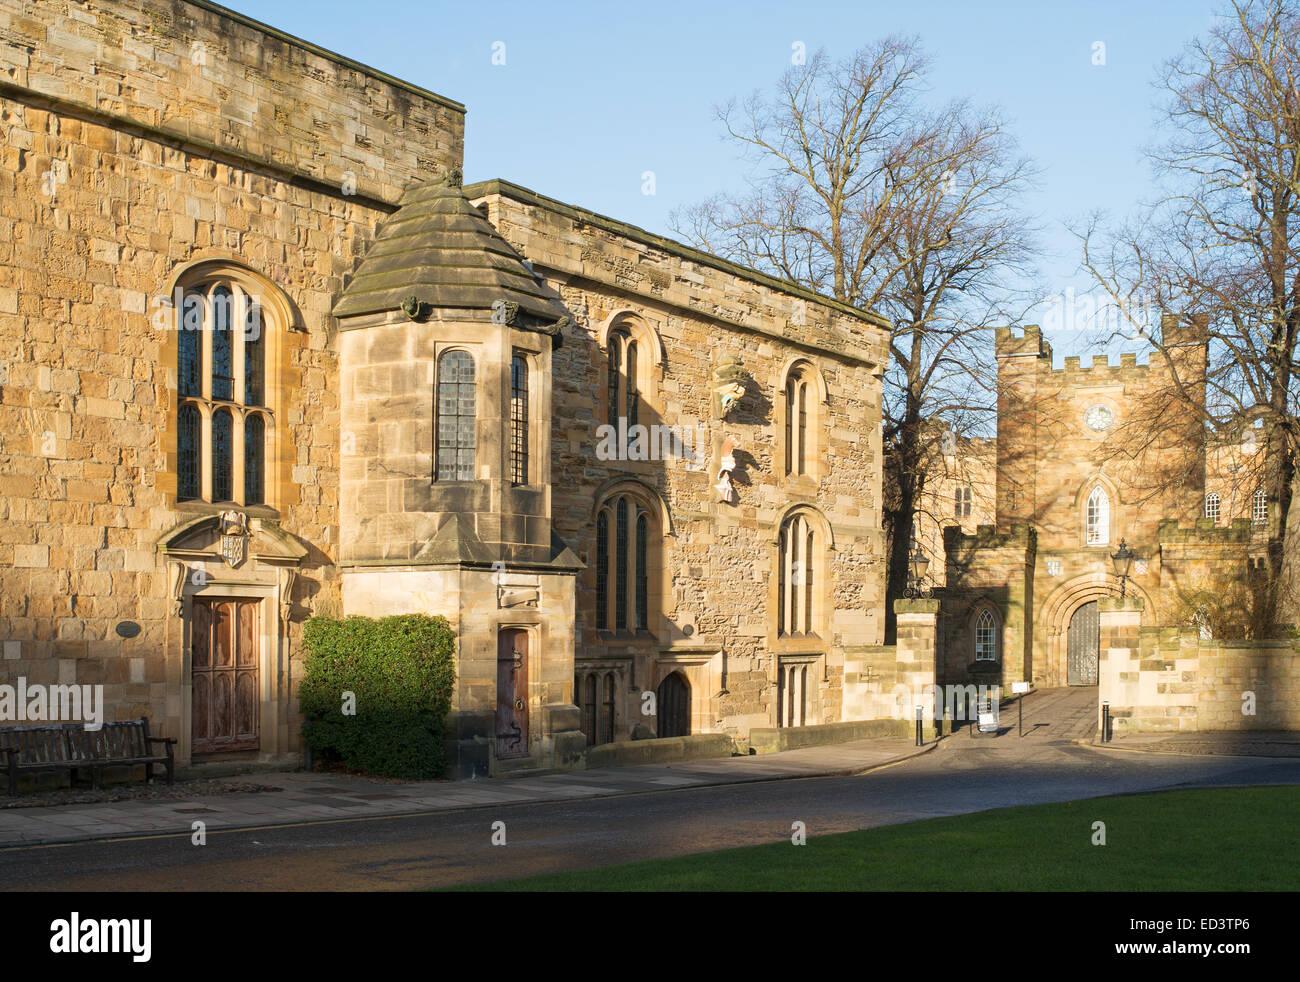 Durham University Palace Green Library and castle gatehouse, Durham City north east England, UK - Stock Image